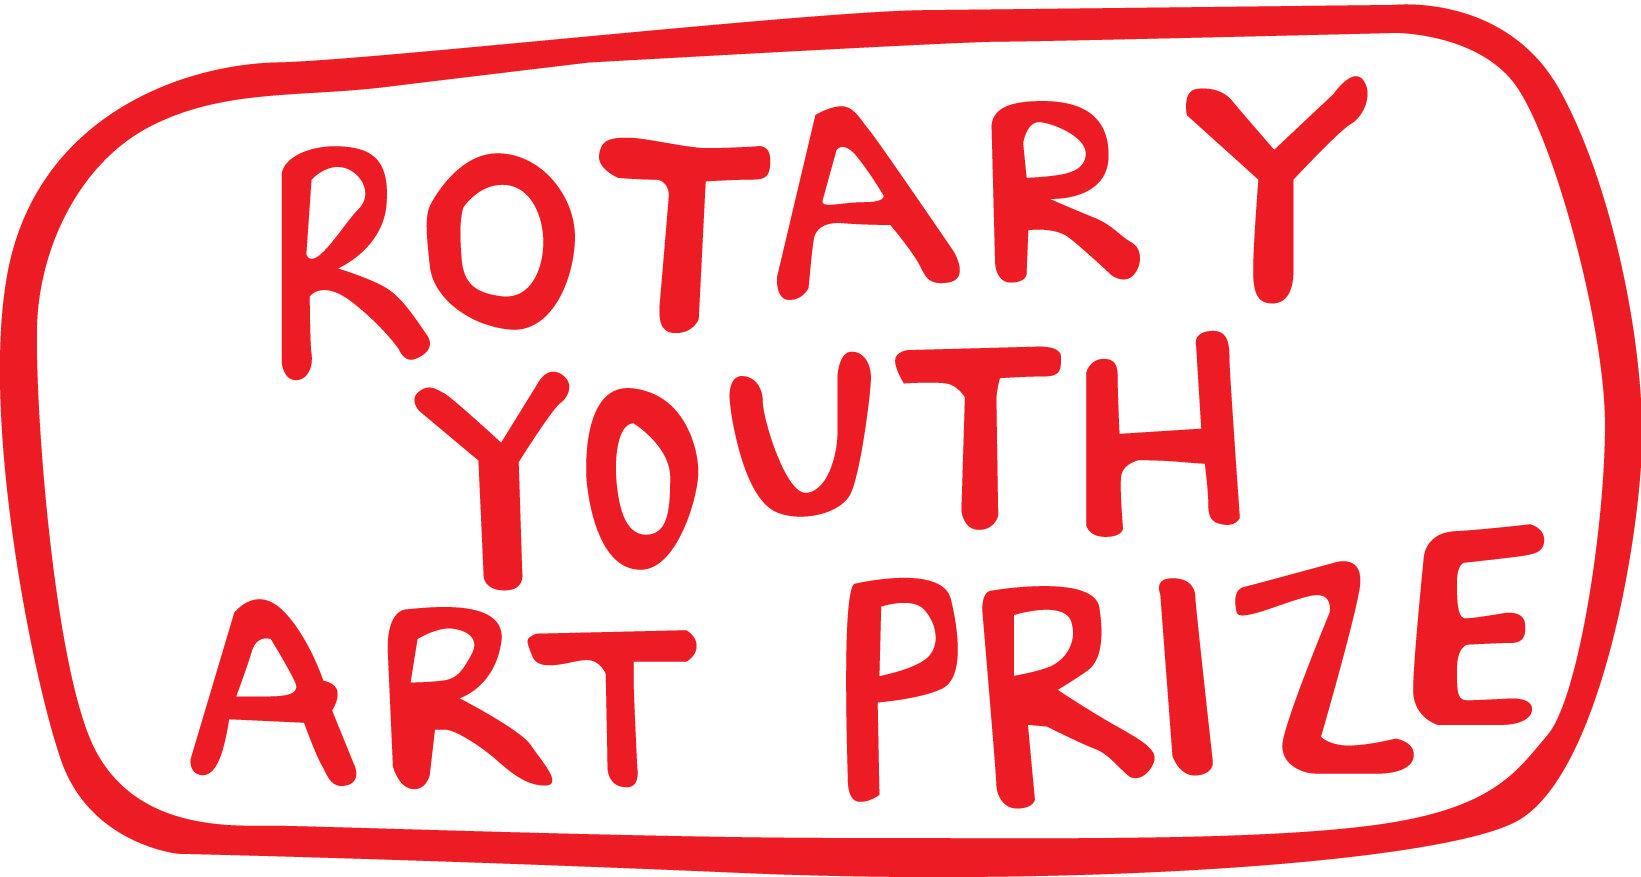 RotaryArtPrize logo.jpg